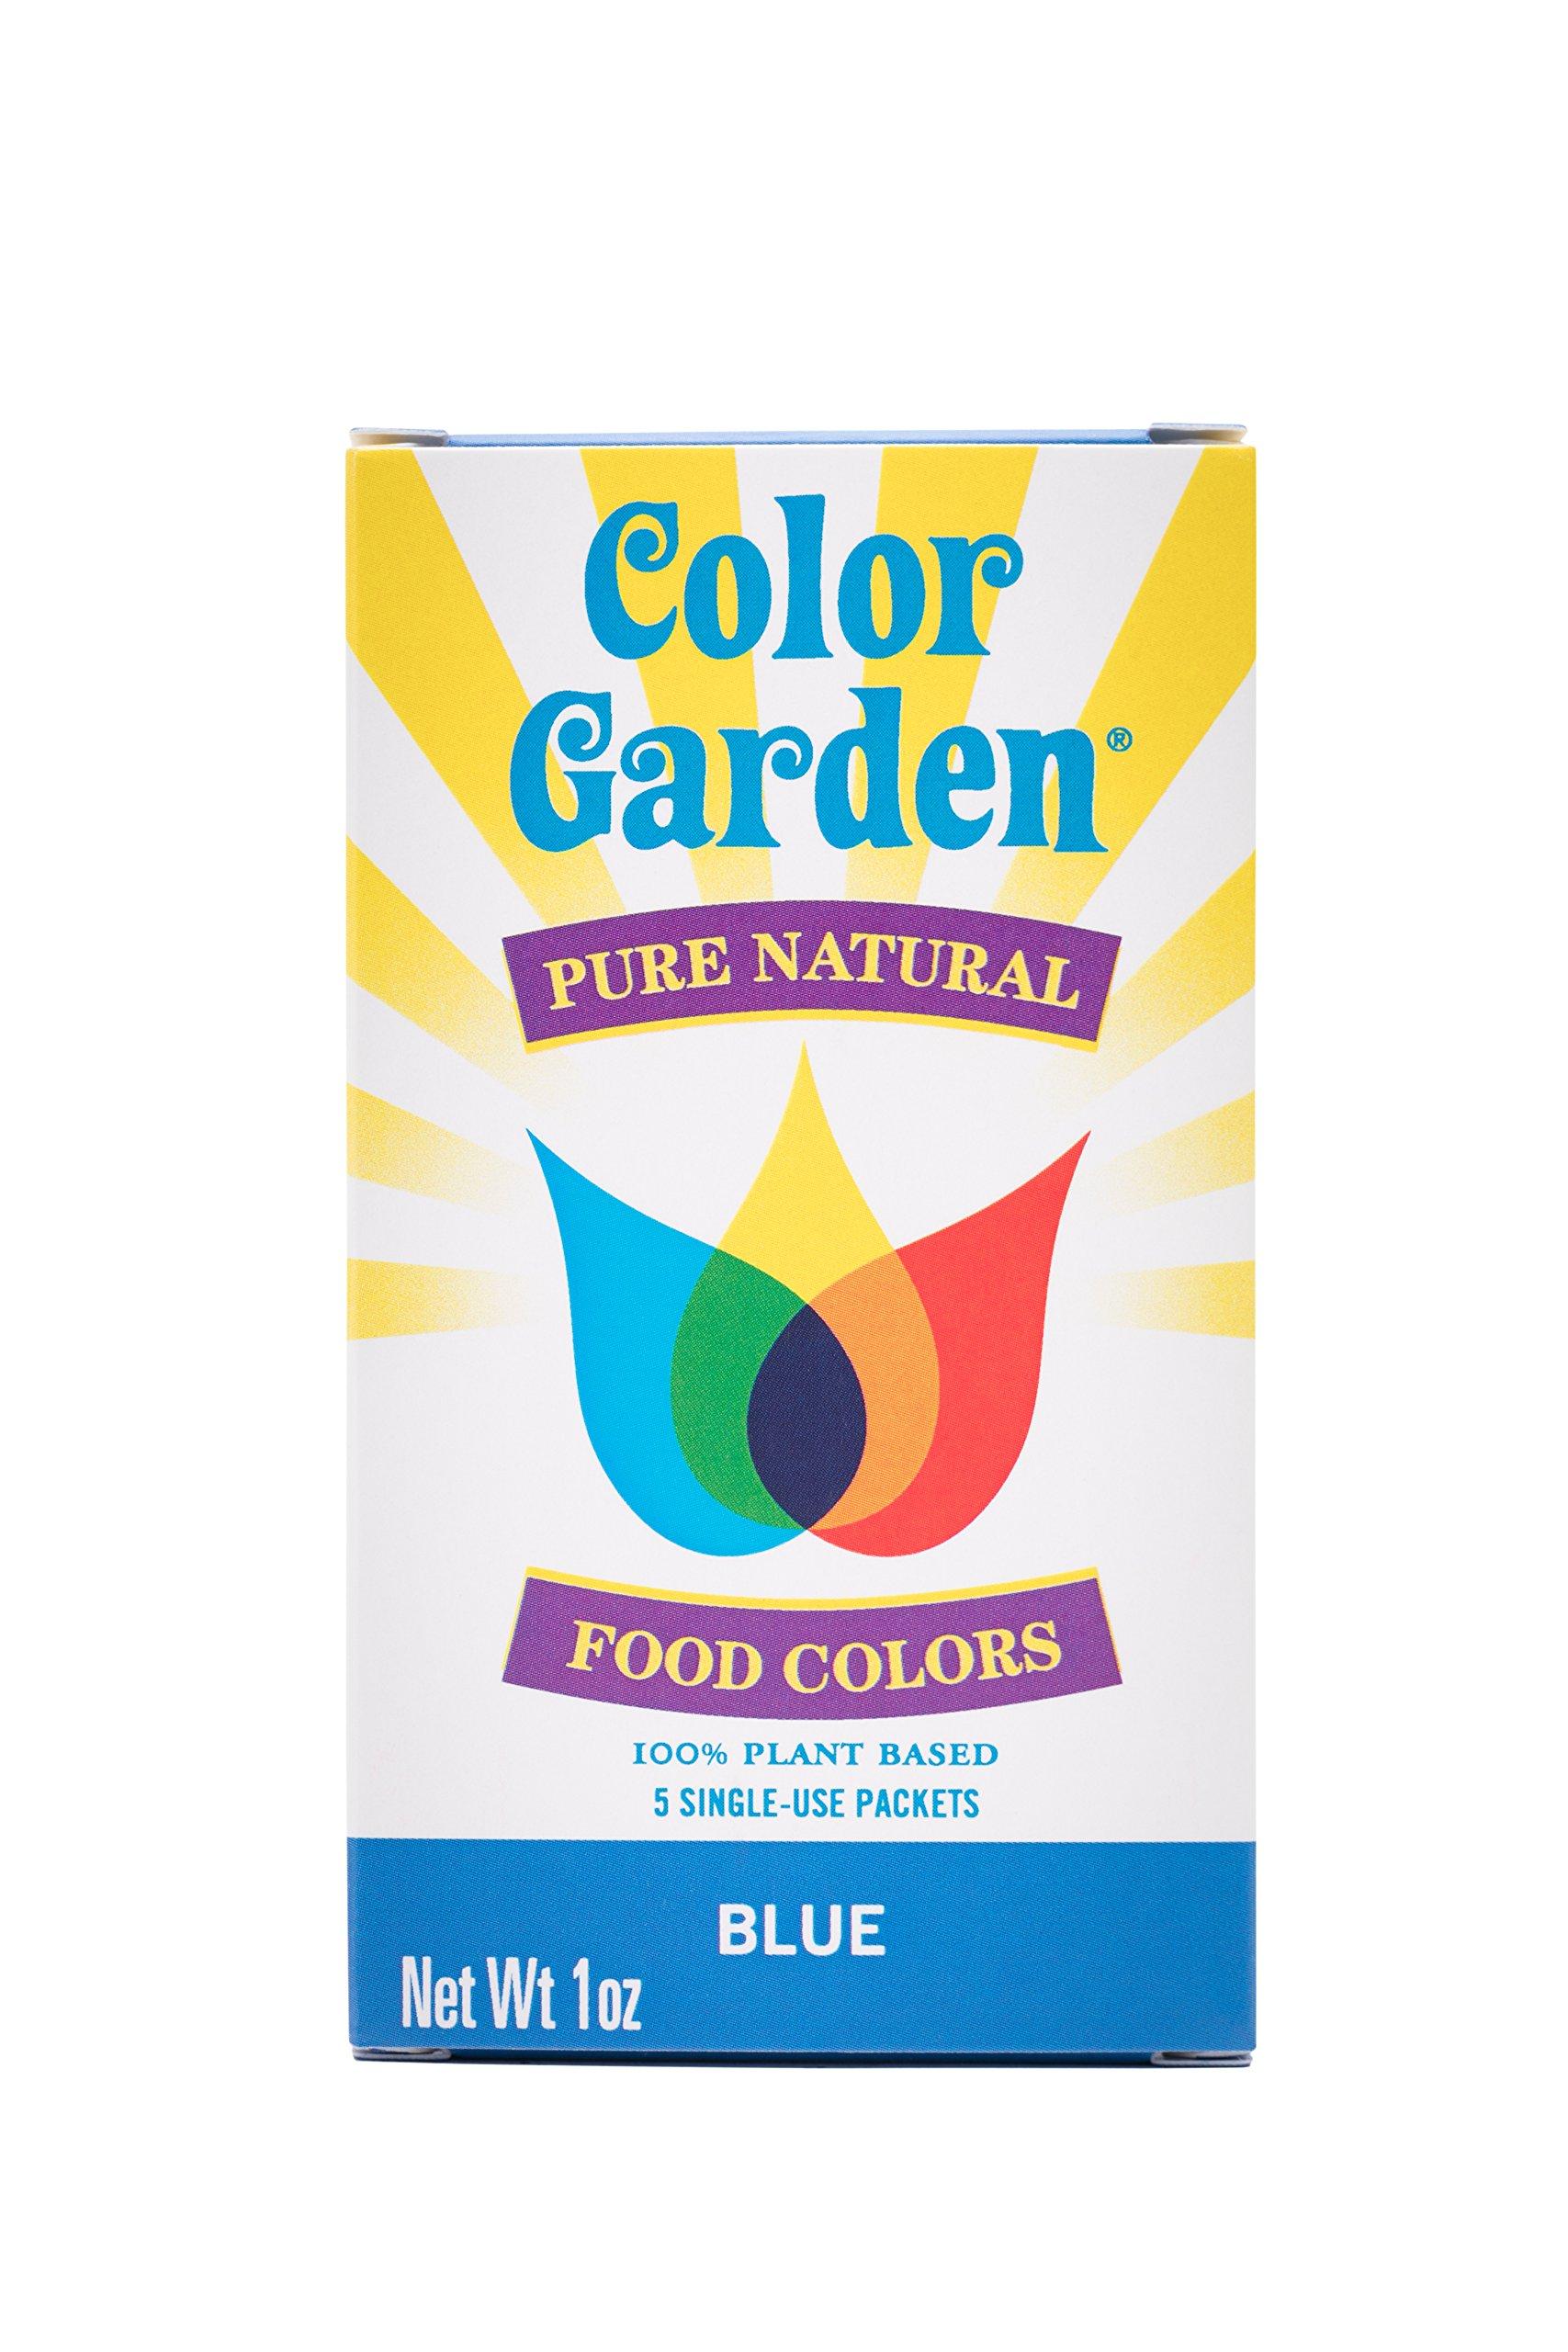 Color Garden Pure Natural Food Colors, Blue 5 ct